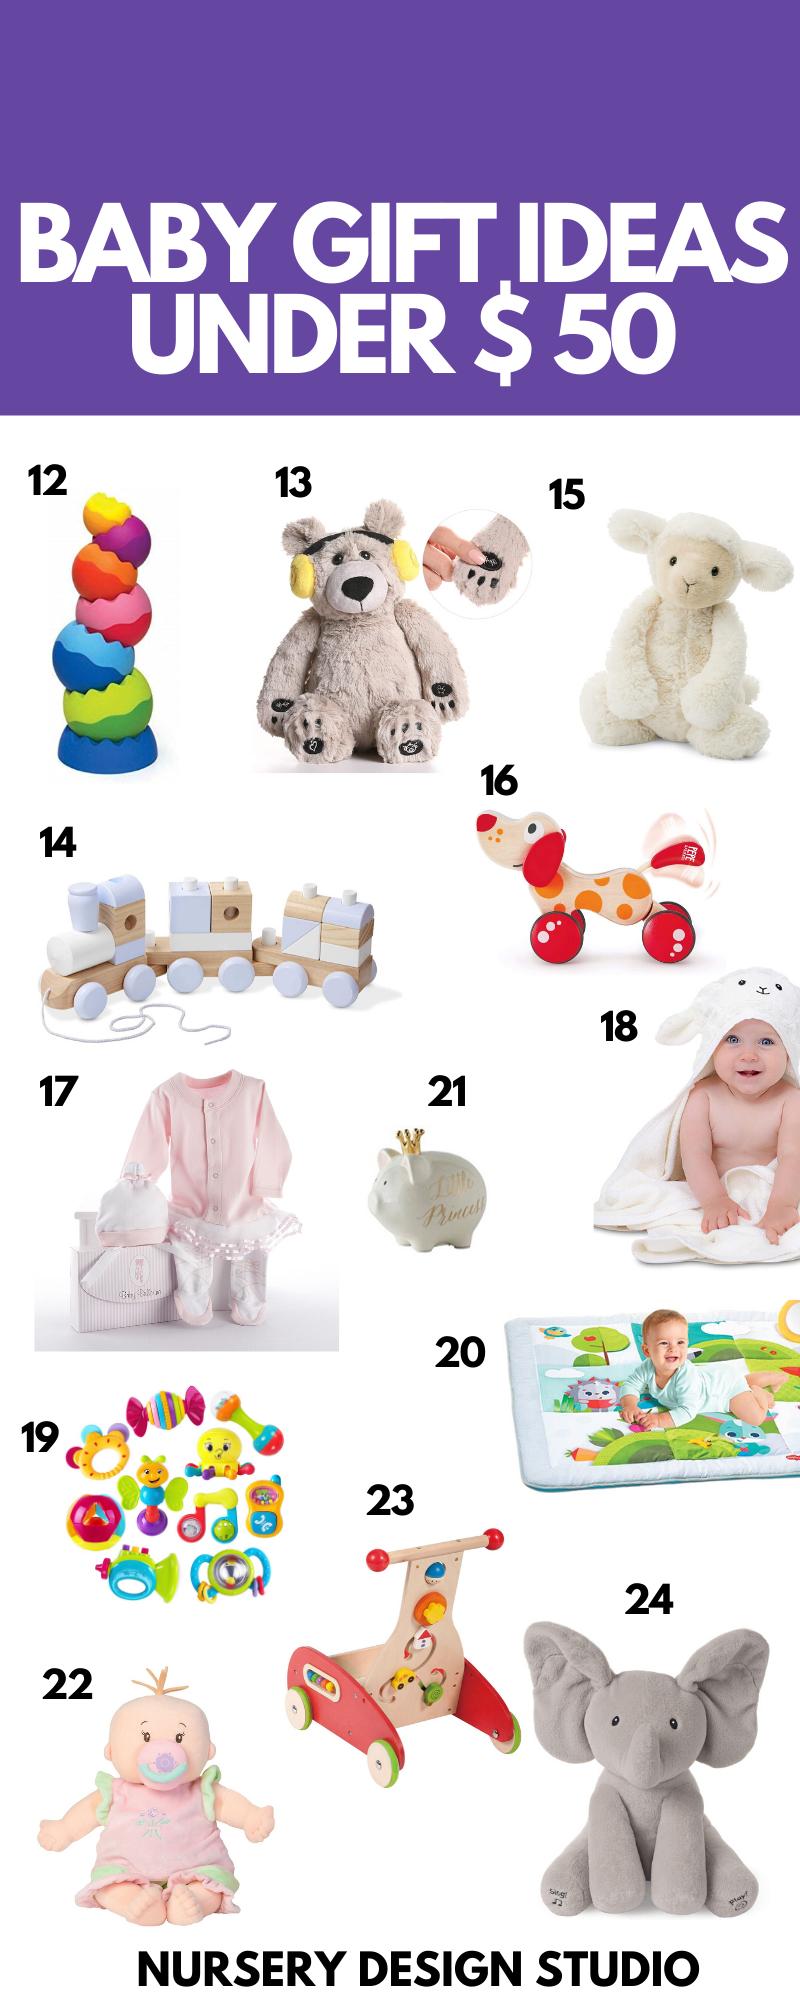 BABY GIFT IDEAS UNDER 50 DOLLARS